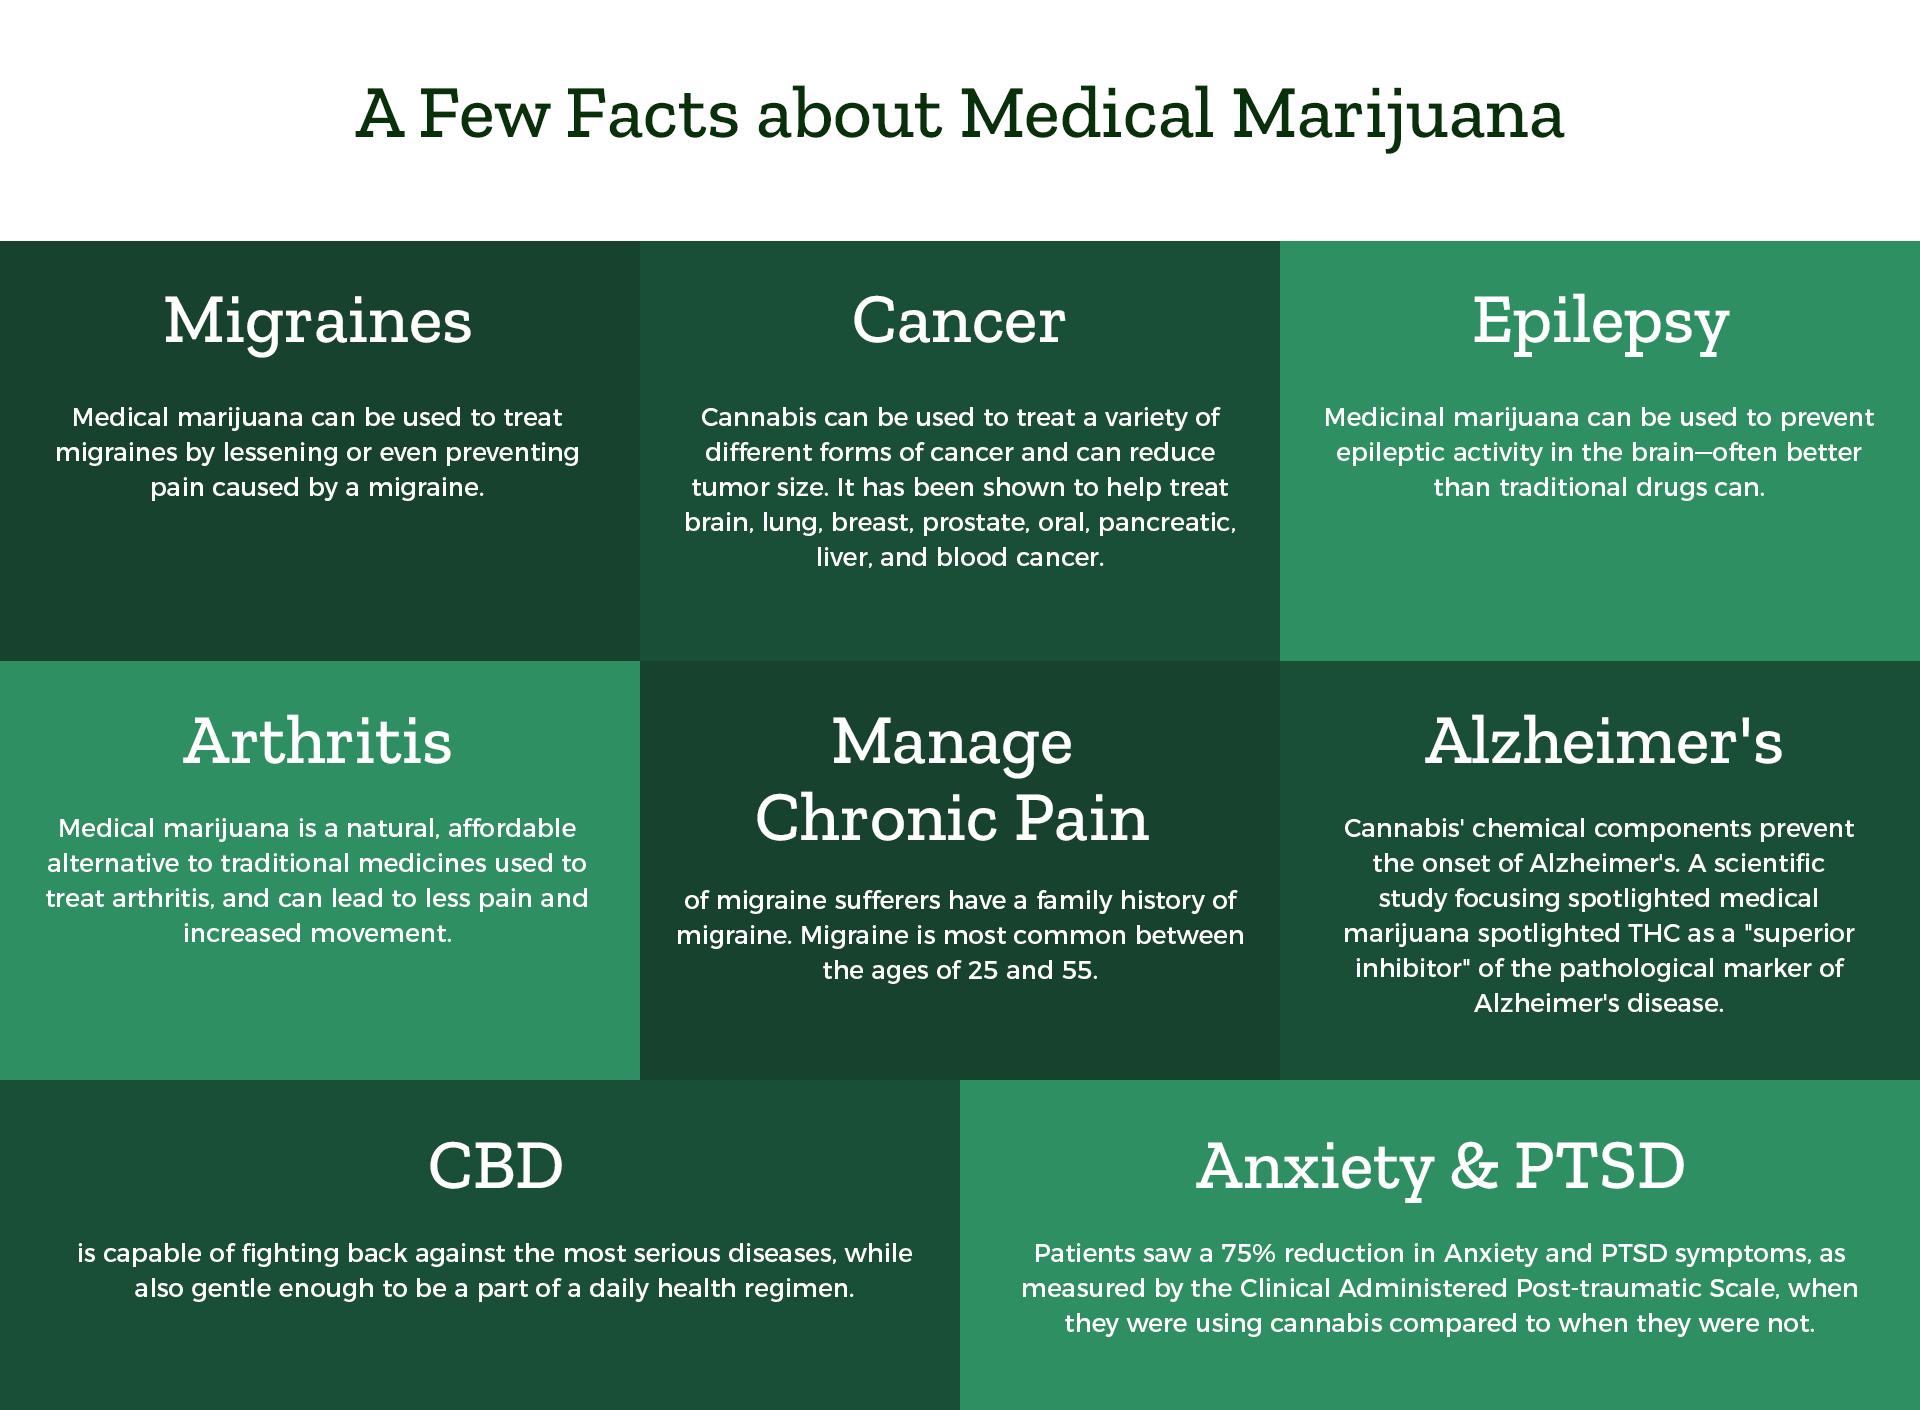 Few facts about Medical Marijuana